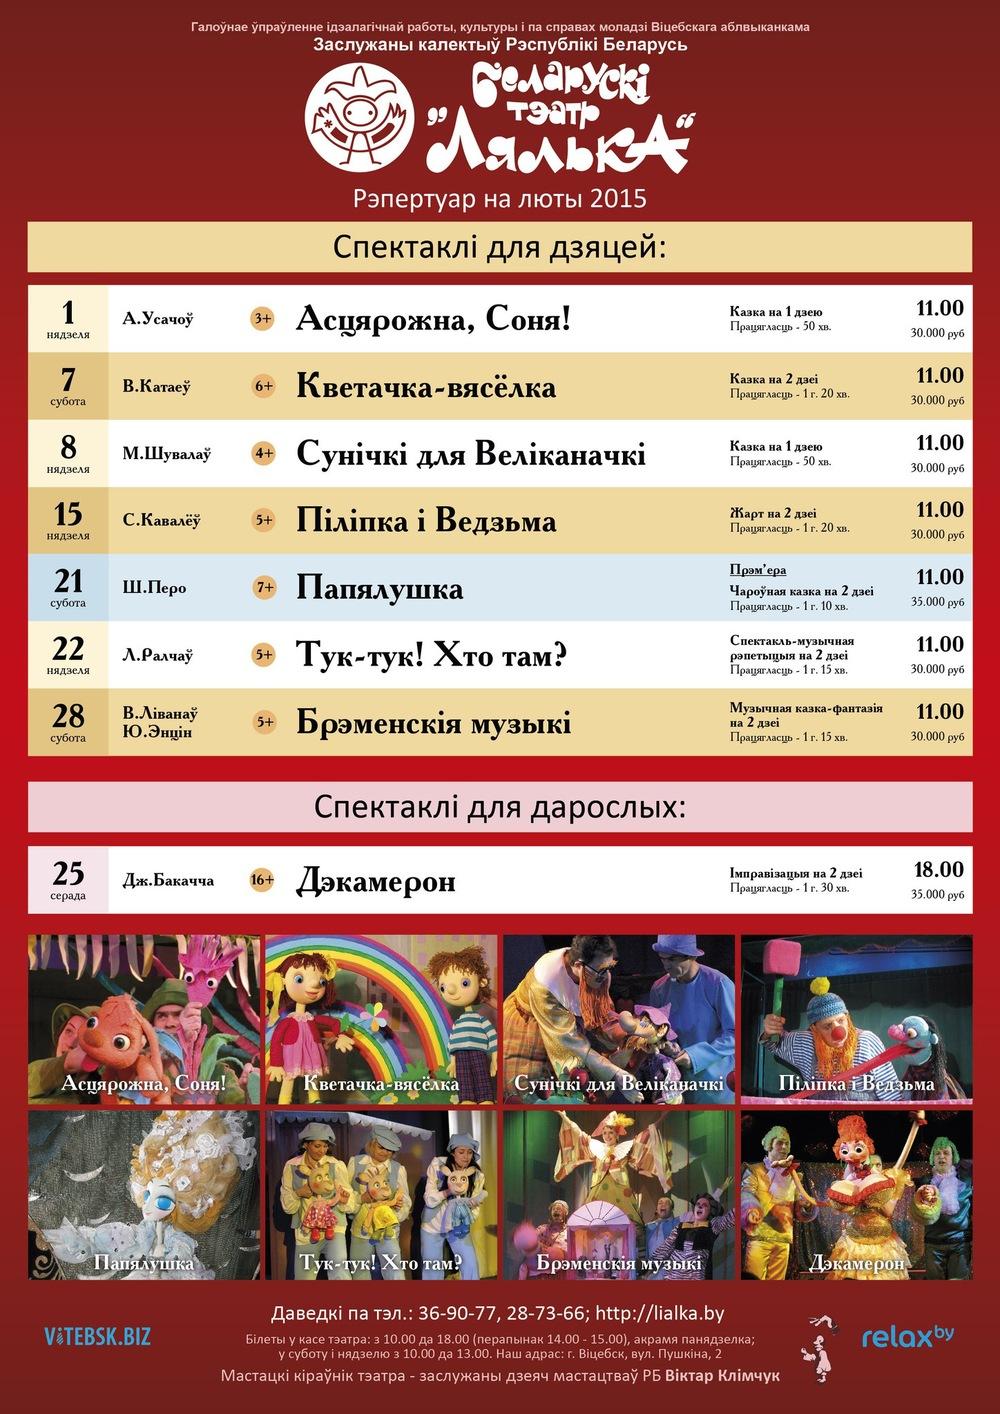 Витебск афиша театра лялька балет щелкунчик цена билета